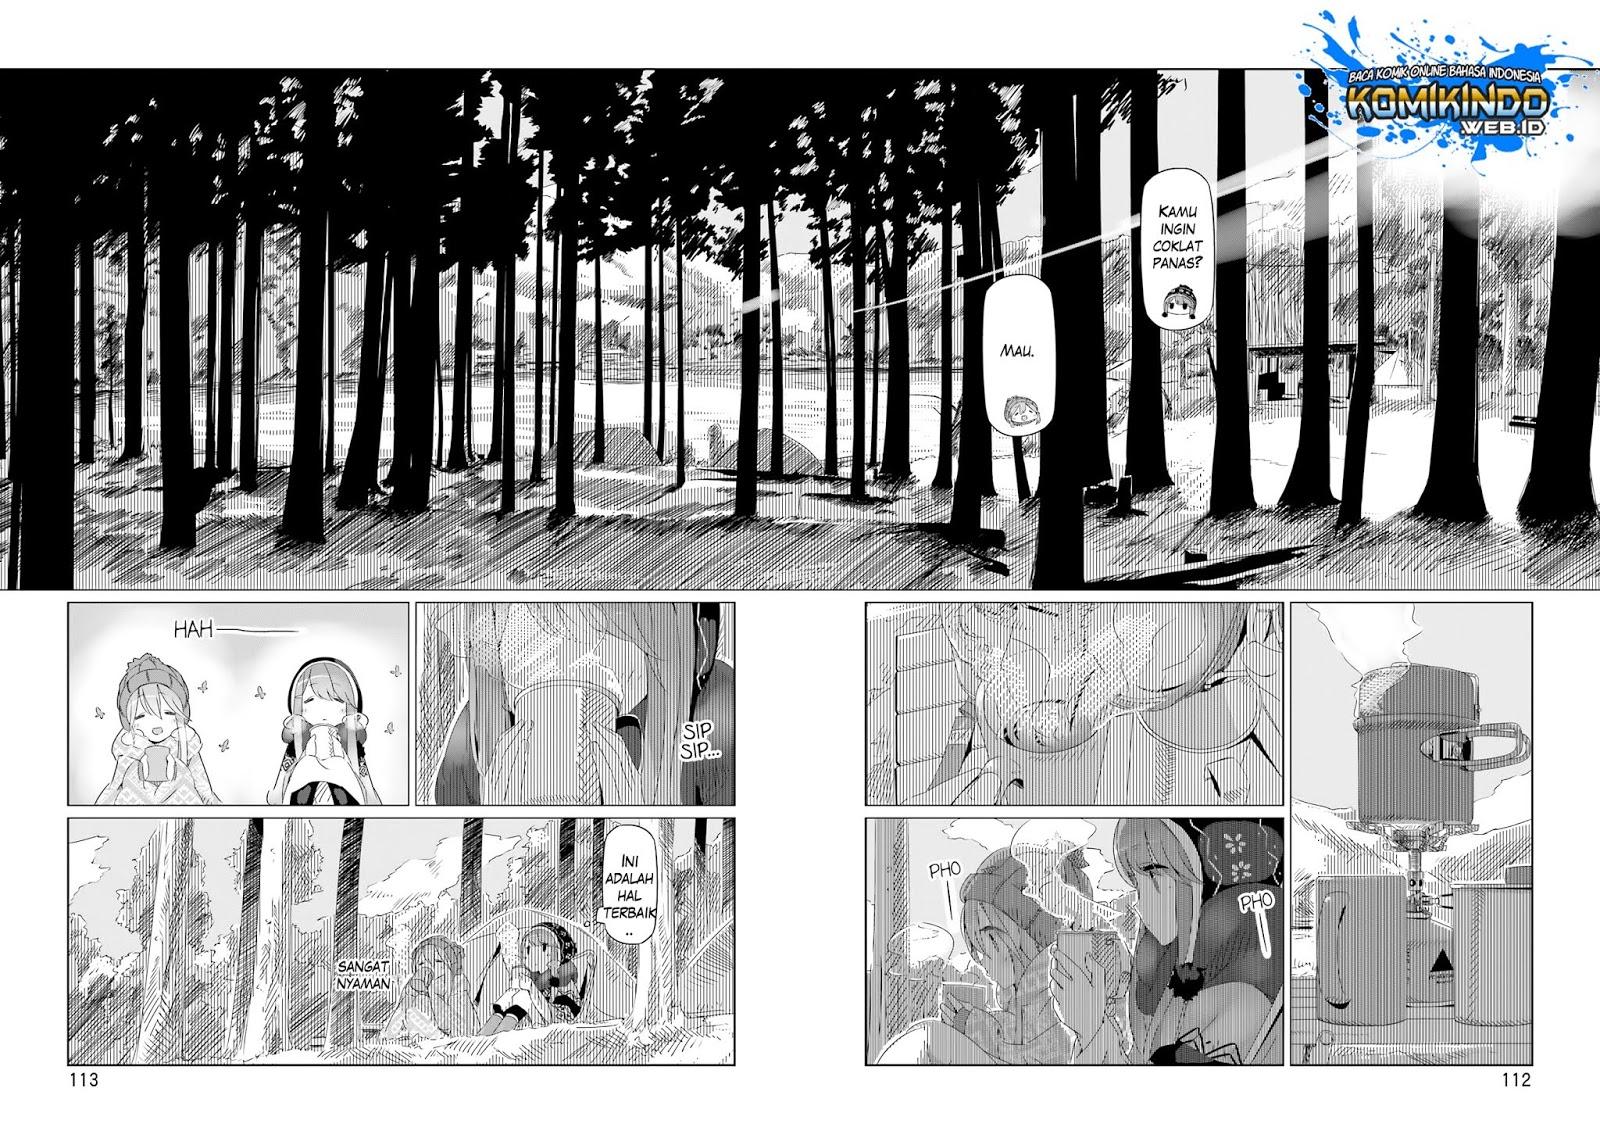 Dilarang COPAS - situs resmi www.mangacanblog.com - Komik yuru camp 011 - chapter 11 12 Indonesia yuru camp 011 - chapter 11 Terbaru 11|Baca Manga Komik Indonesia|Mangacan